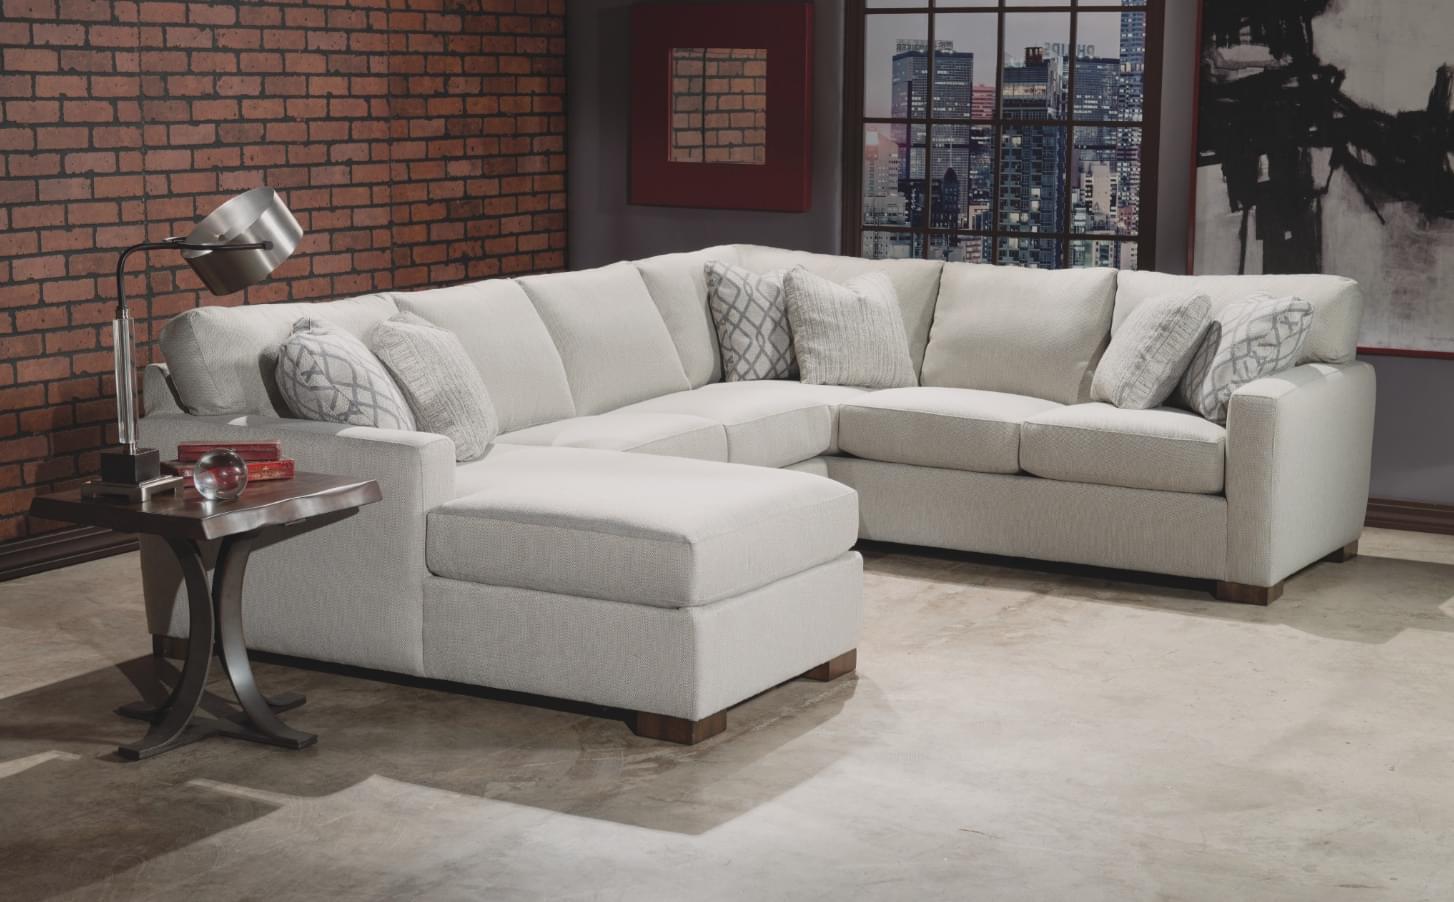 Flexsteel Bryant sofa at Mums Place Furniture Monterey CA